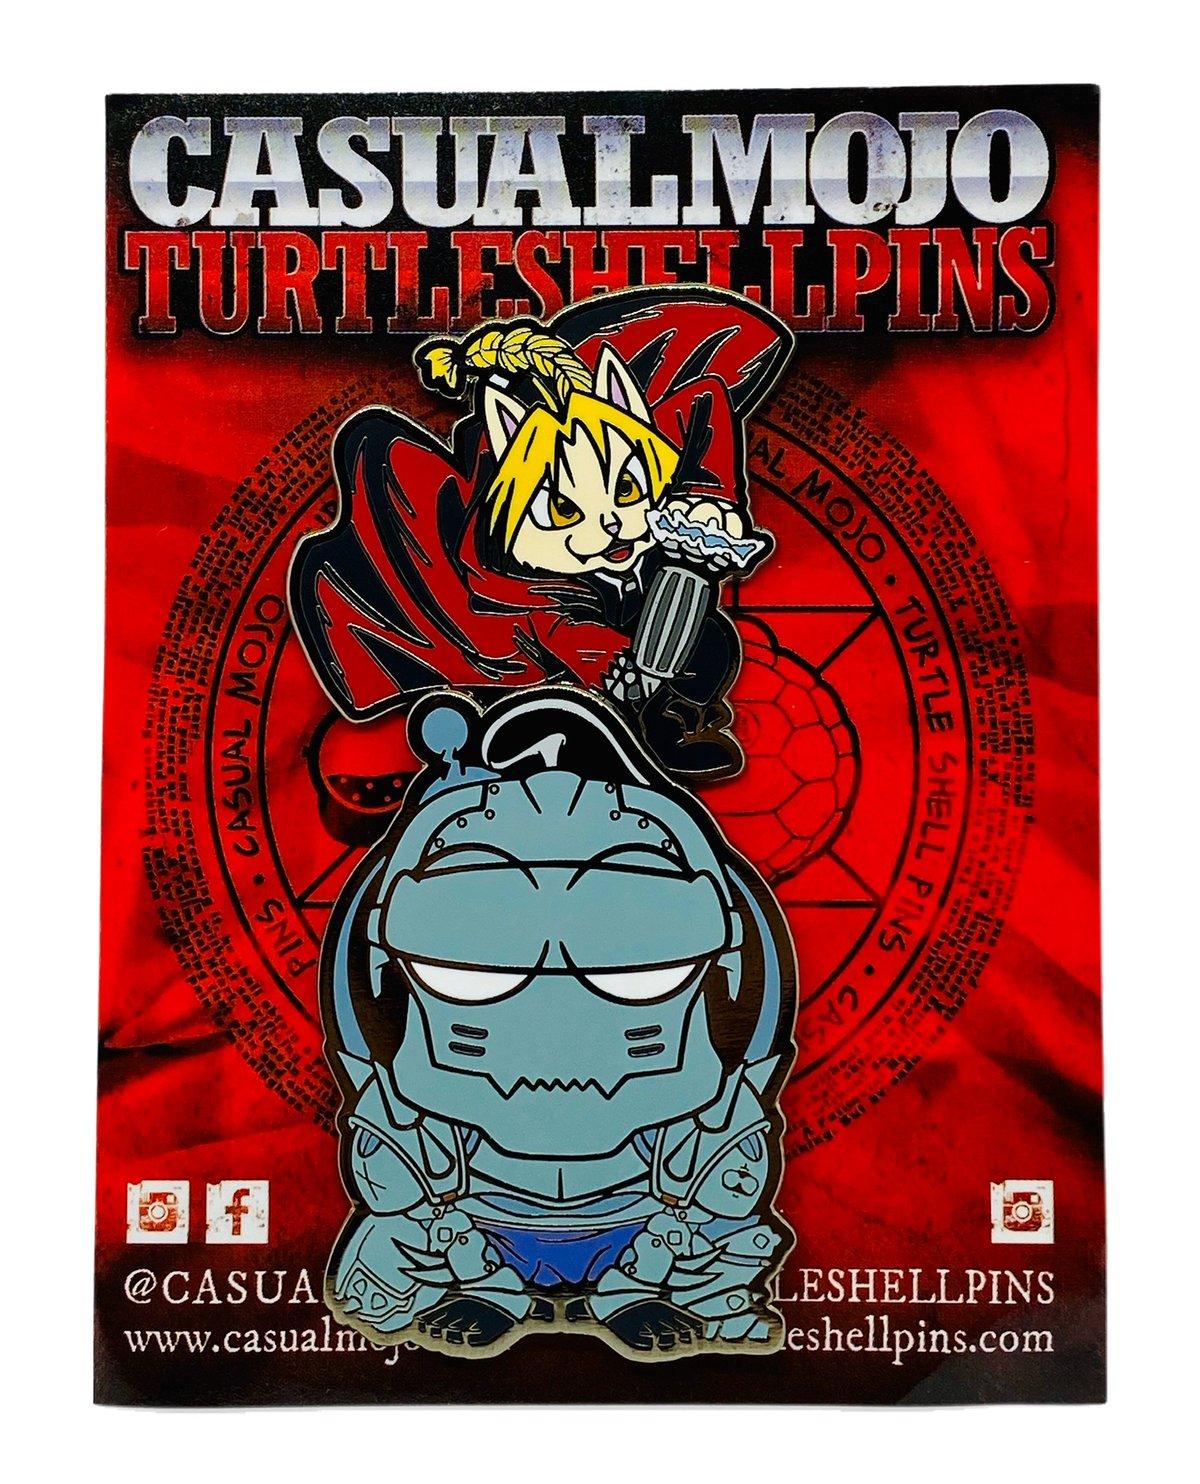 Furmetal Alchemist - The @turtleshellpins x @casualmojo 2019 Collaboration